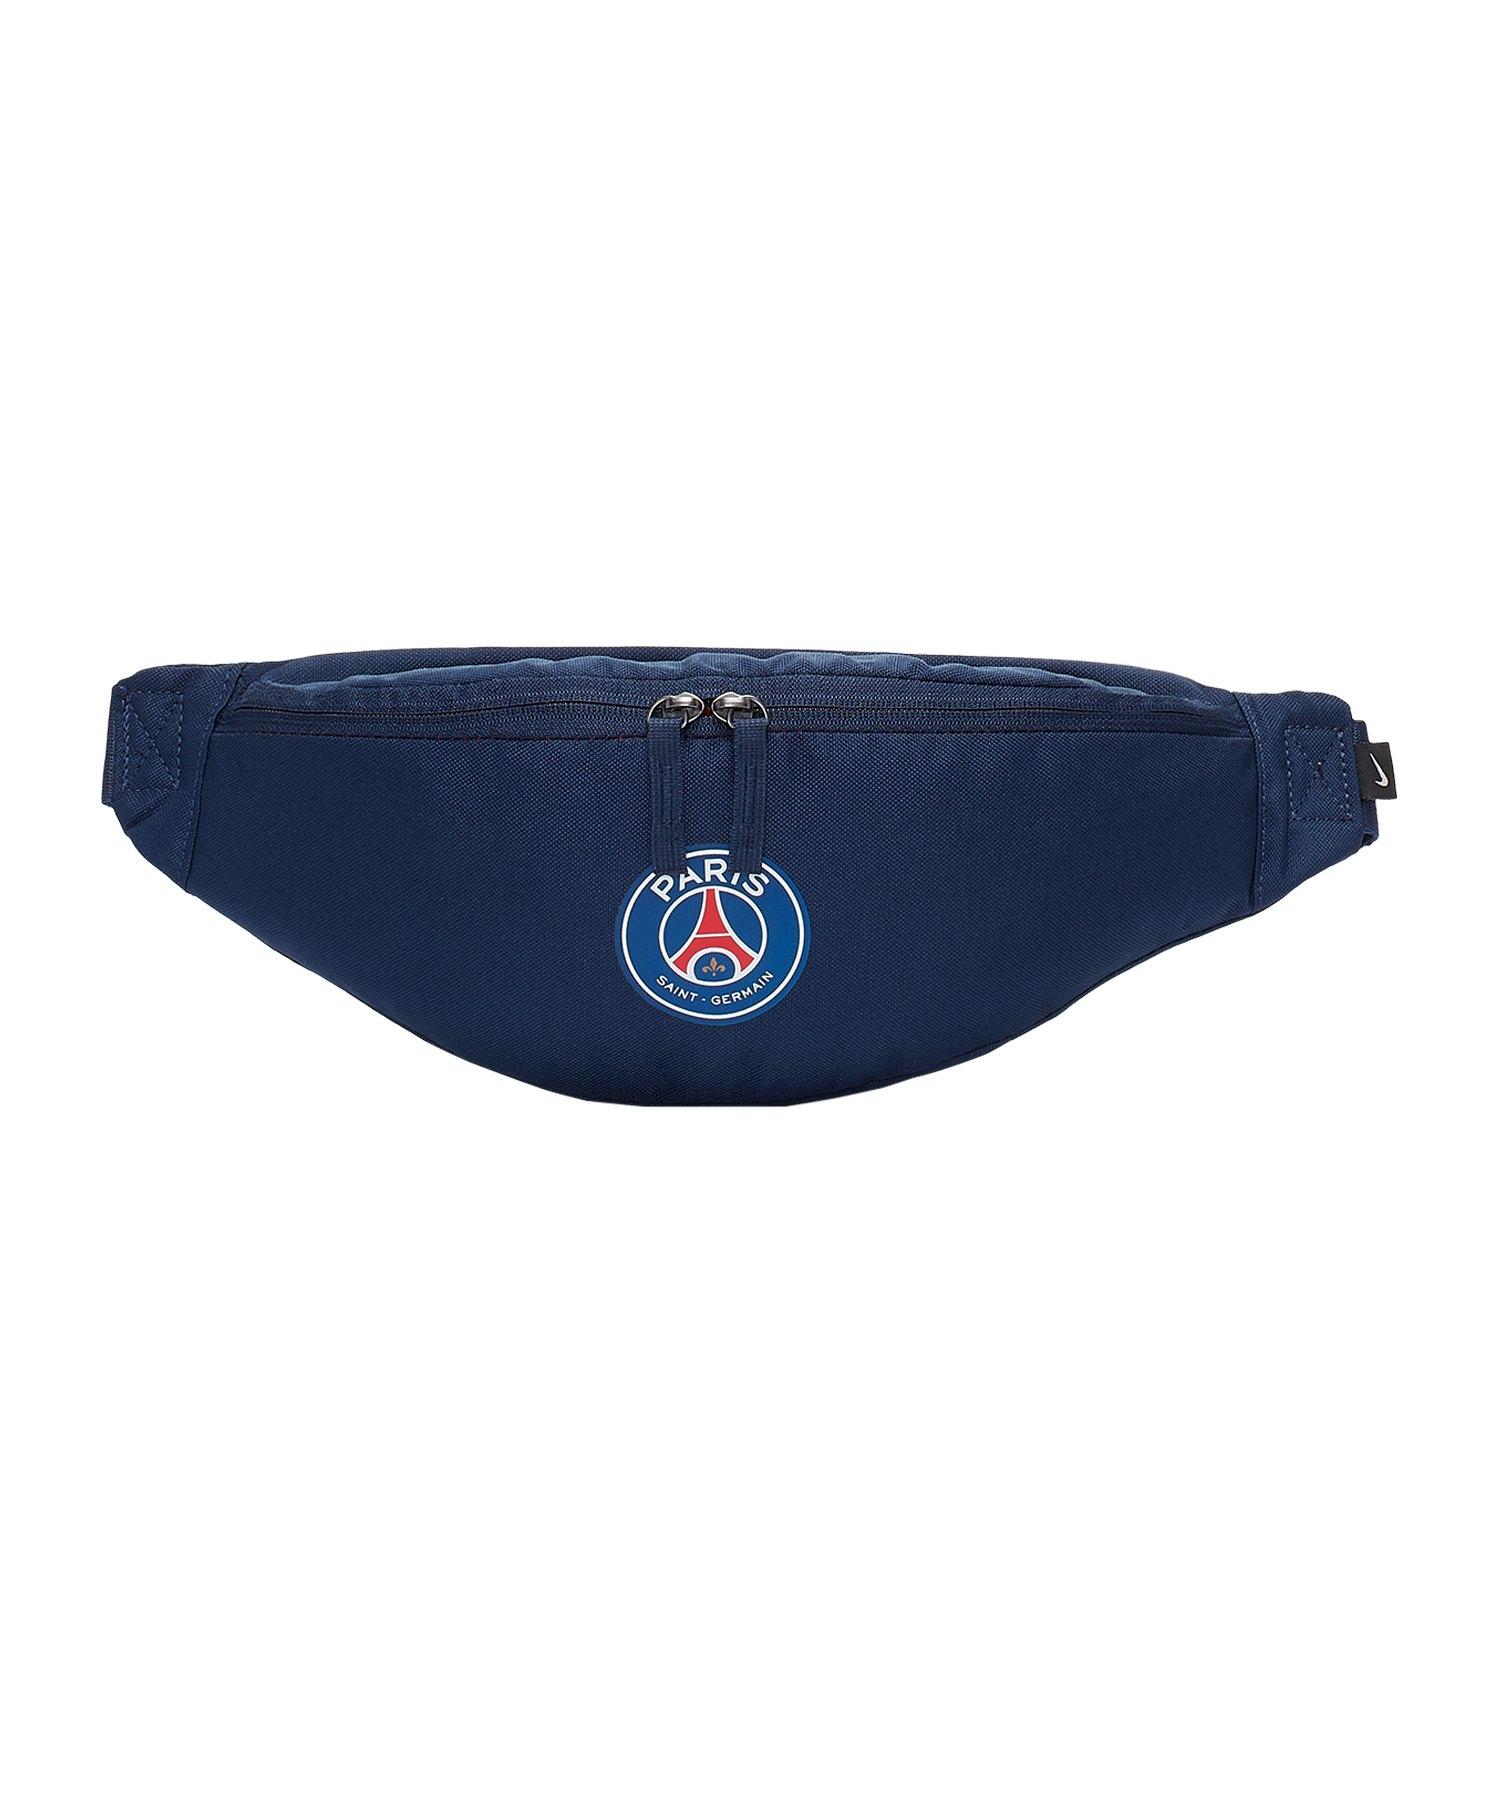 Nike Paris St. Germain Hip Pack Hüfttasche F410 - blau